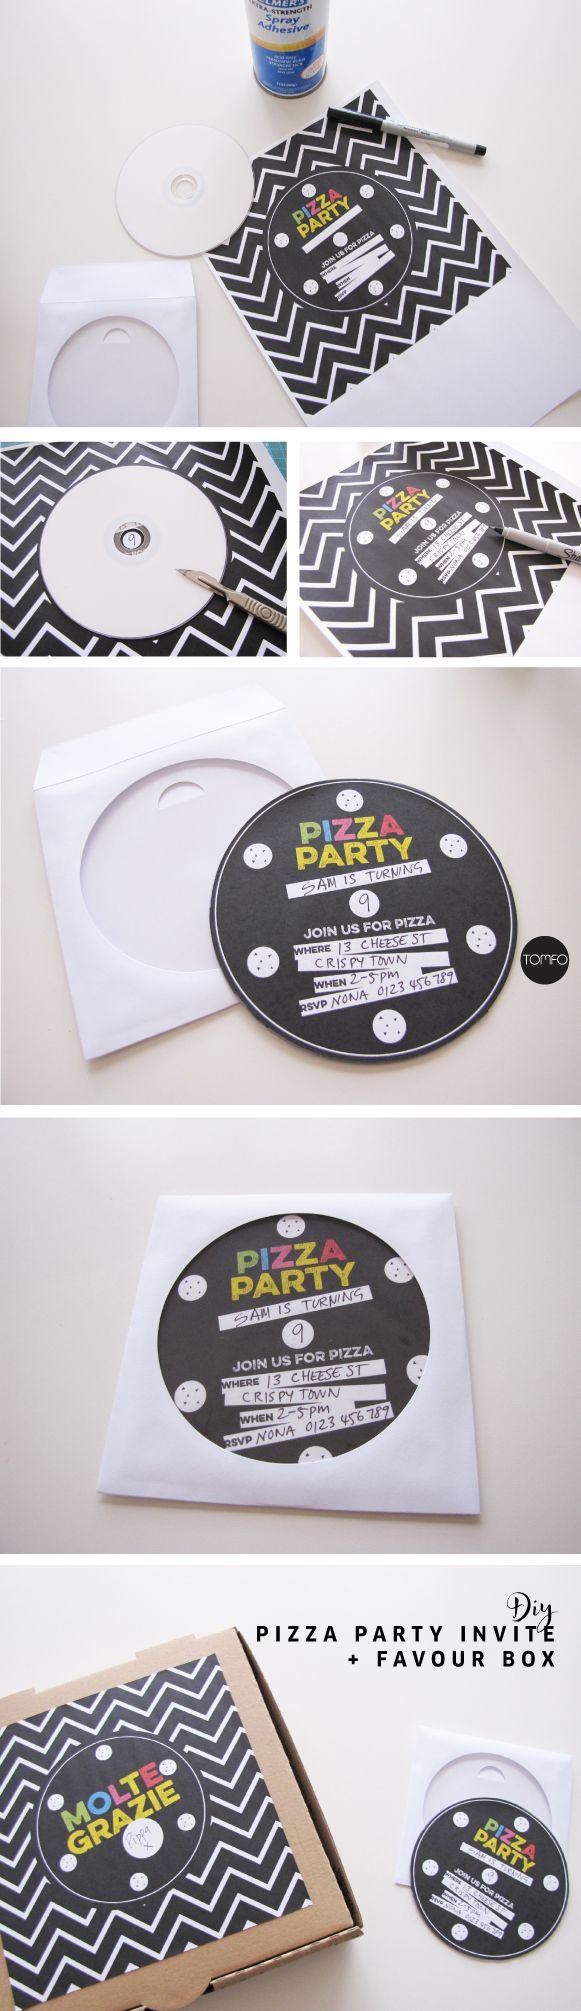 10 best Invitaciones CD images on Pinterest | Bridal invitations ...